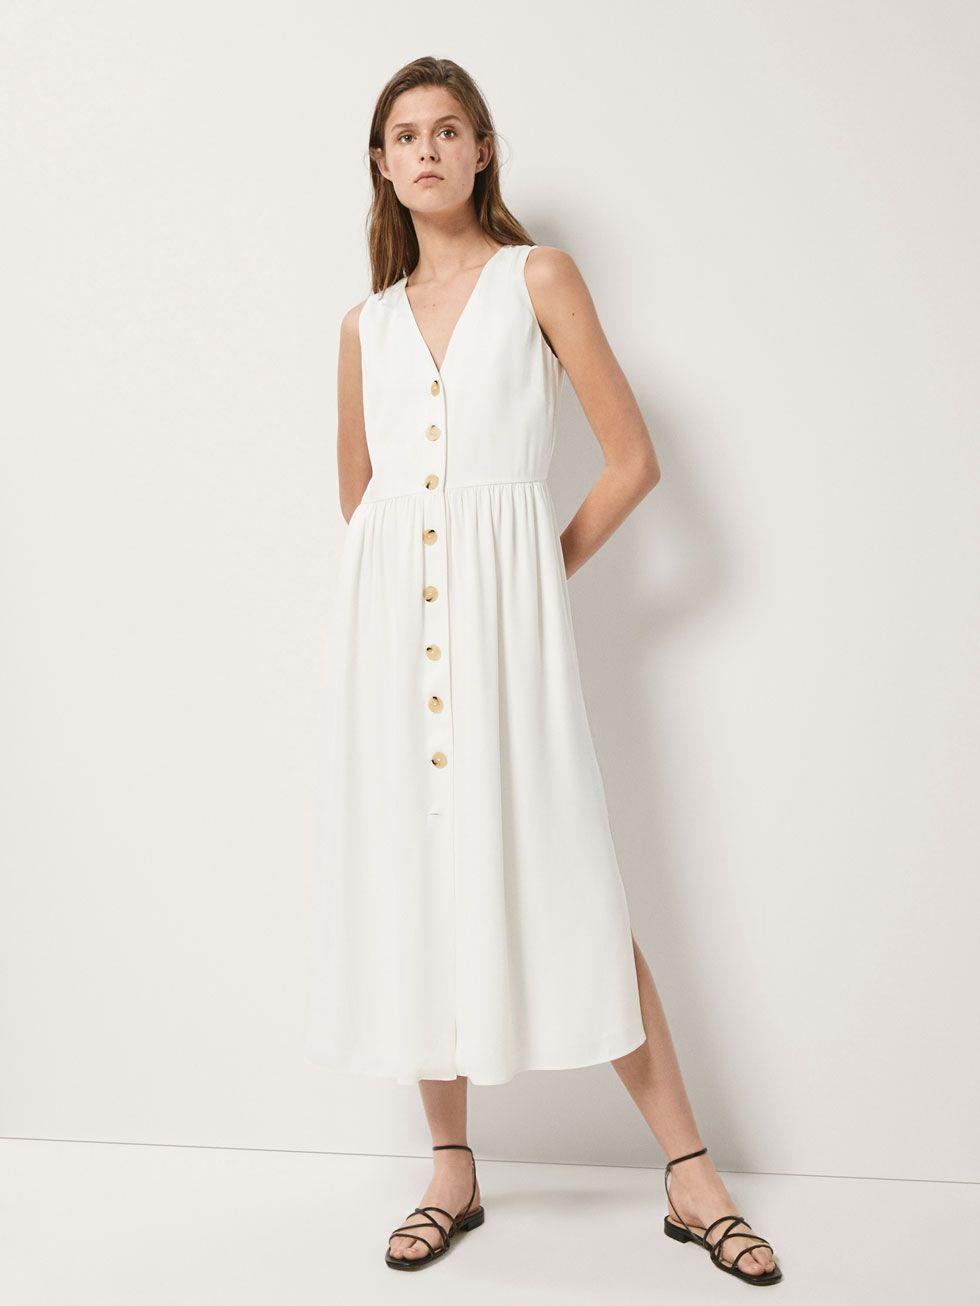 dbf425468 BUTTONED DRESS - Women - Massimo Dutti